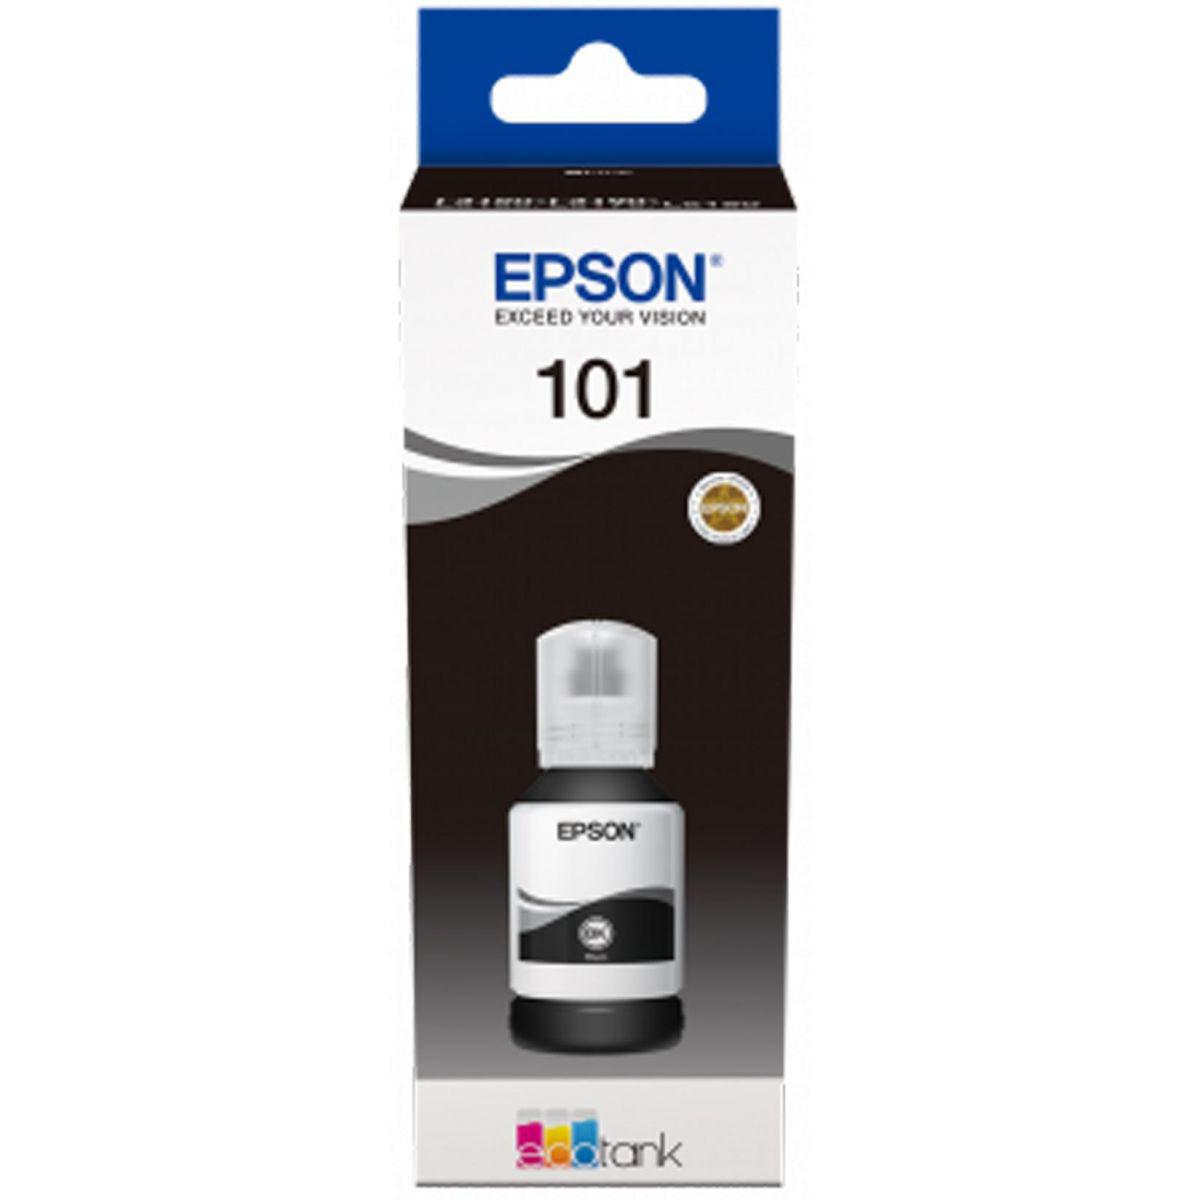 Epson 101 EcoTank Ink Cartridge (C13T03V14A) 127ml - Black